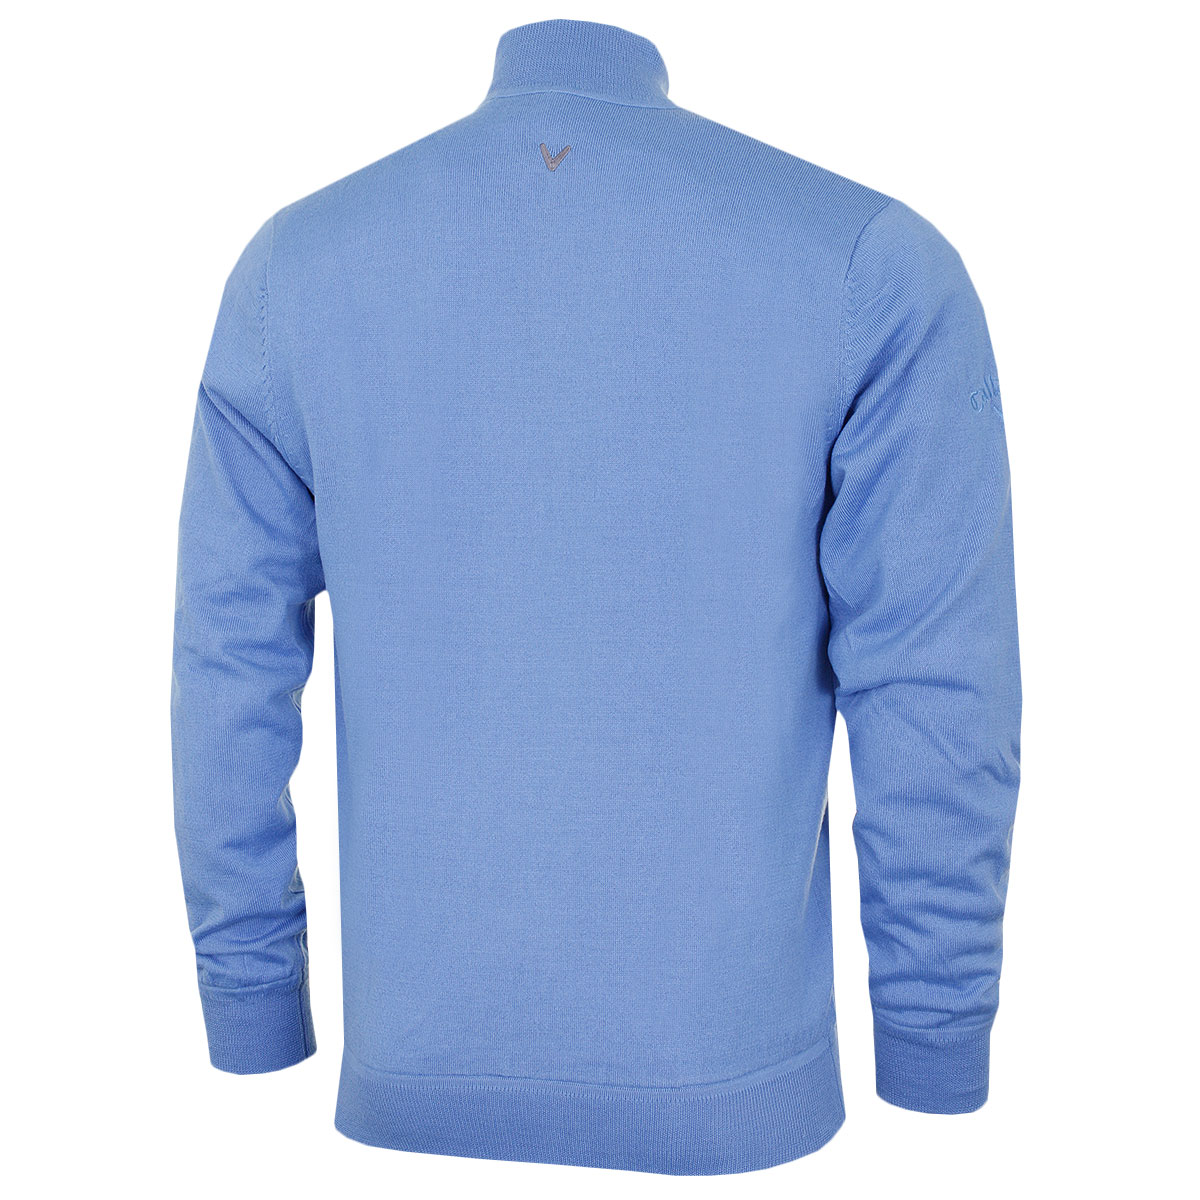 Callaway-Golf-Mens-1-4-Zip-Mock-Merino-Windproof-Sweater-Pullover-43-OFF-RRP thumbnail 19